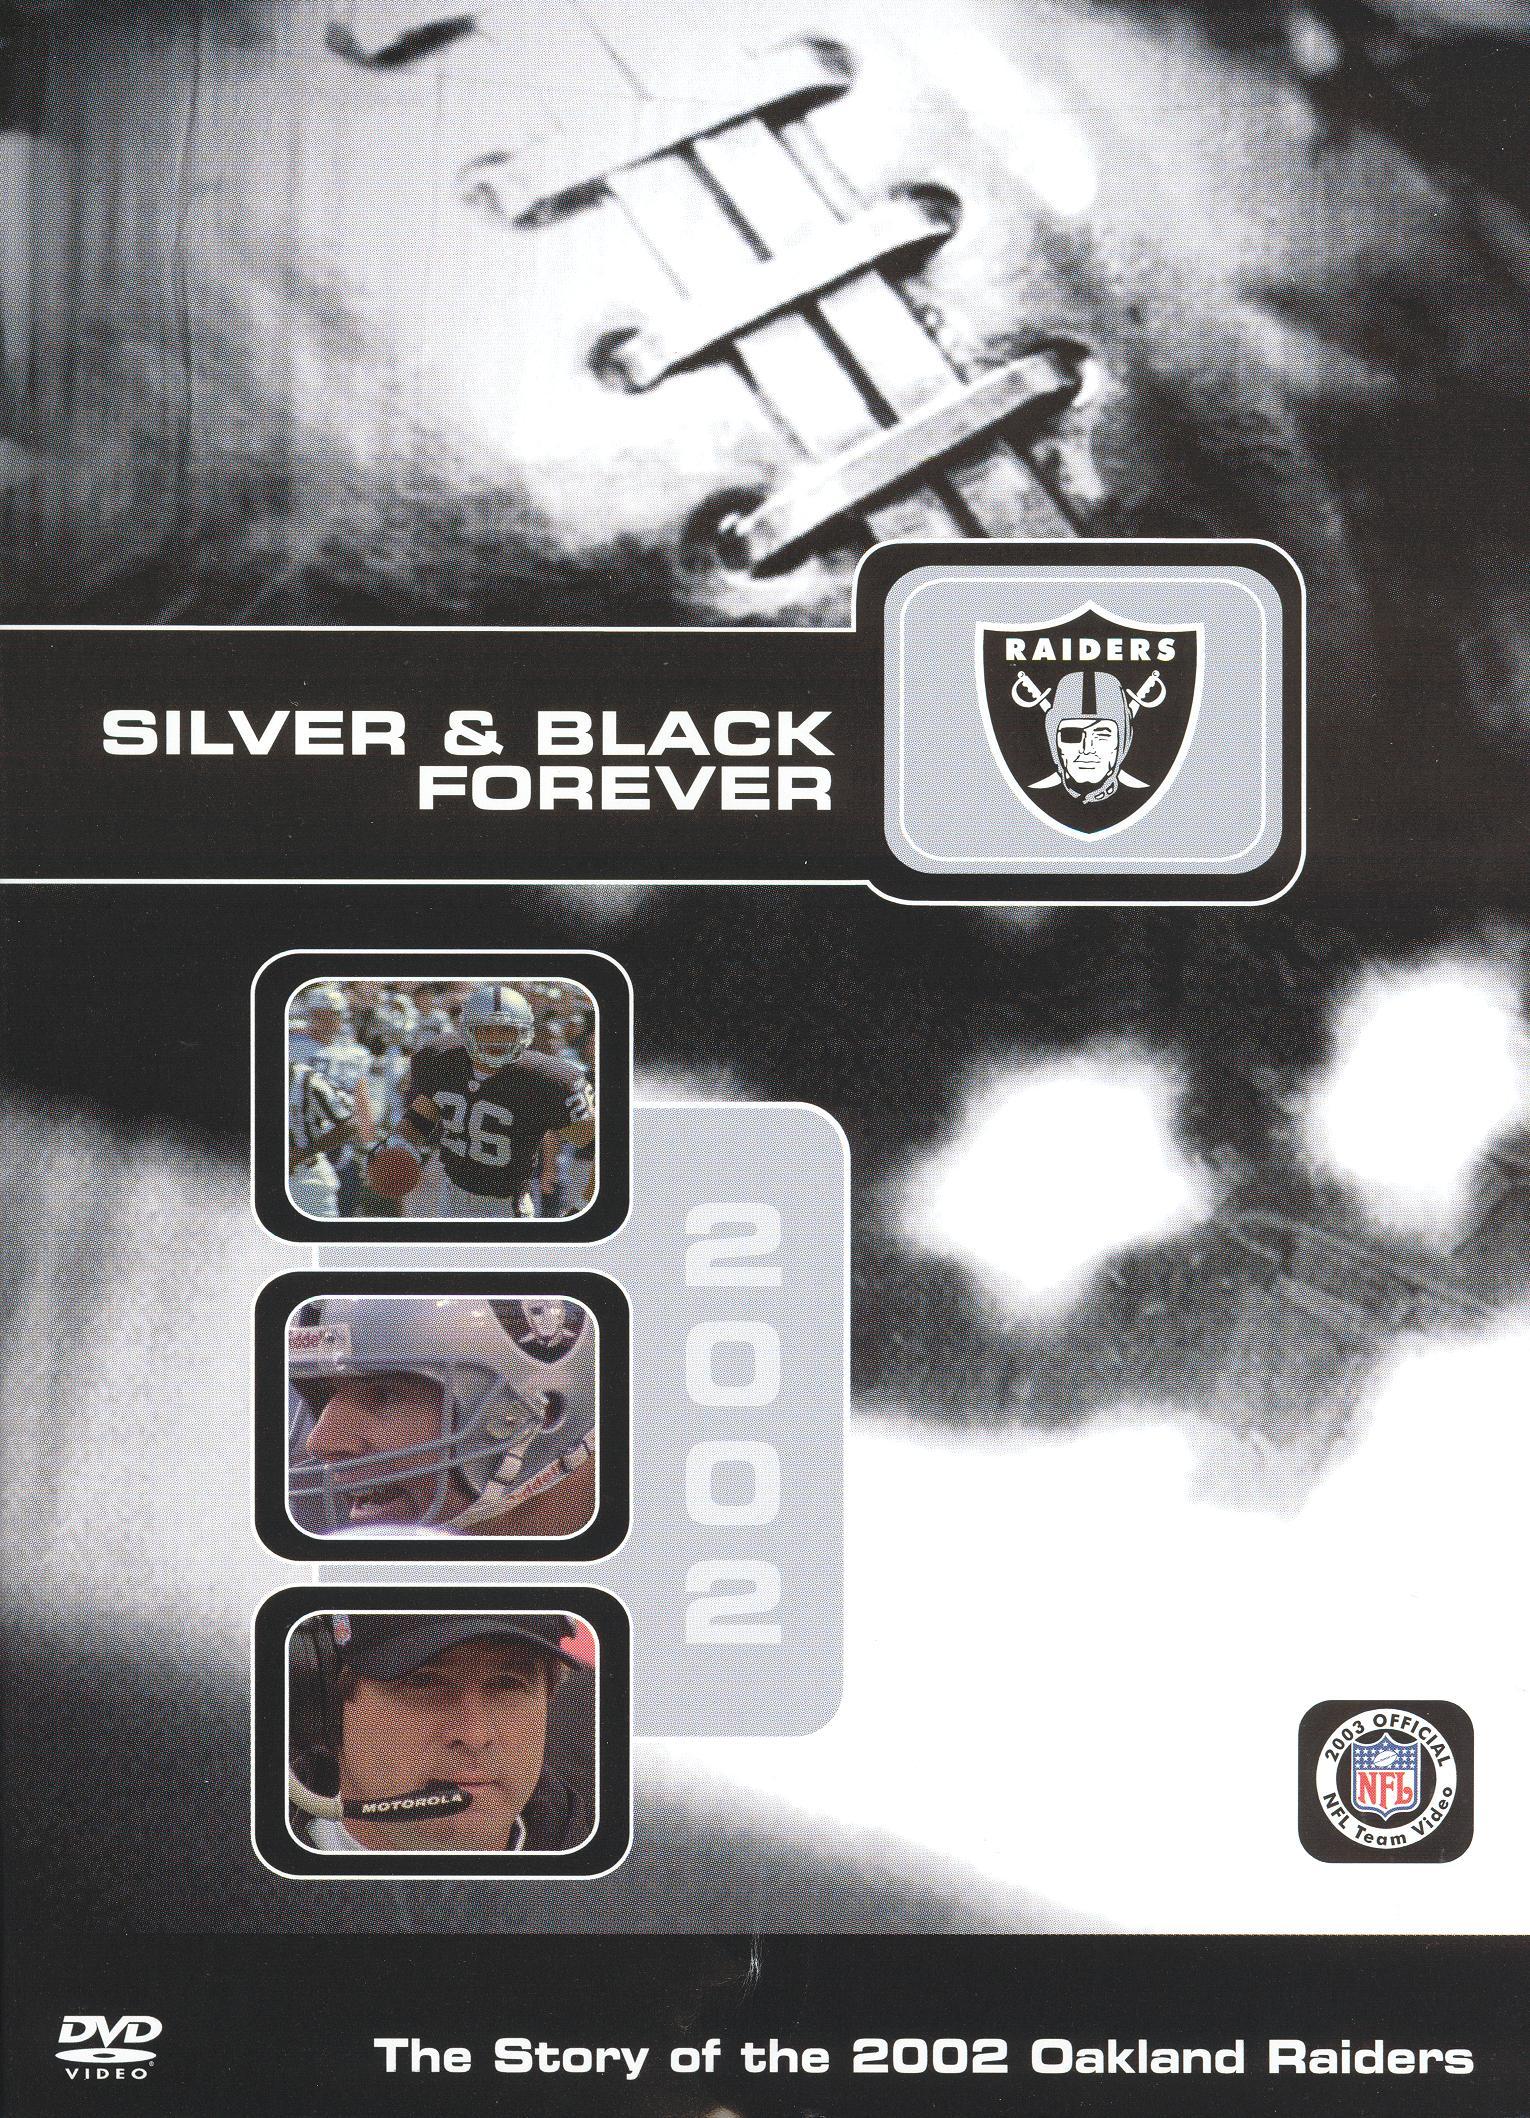 NFL: 2002 Oakland Raiders Team Video - Silver & Black Forever